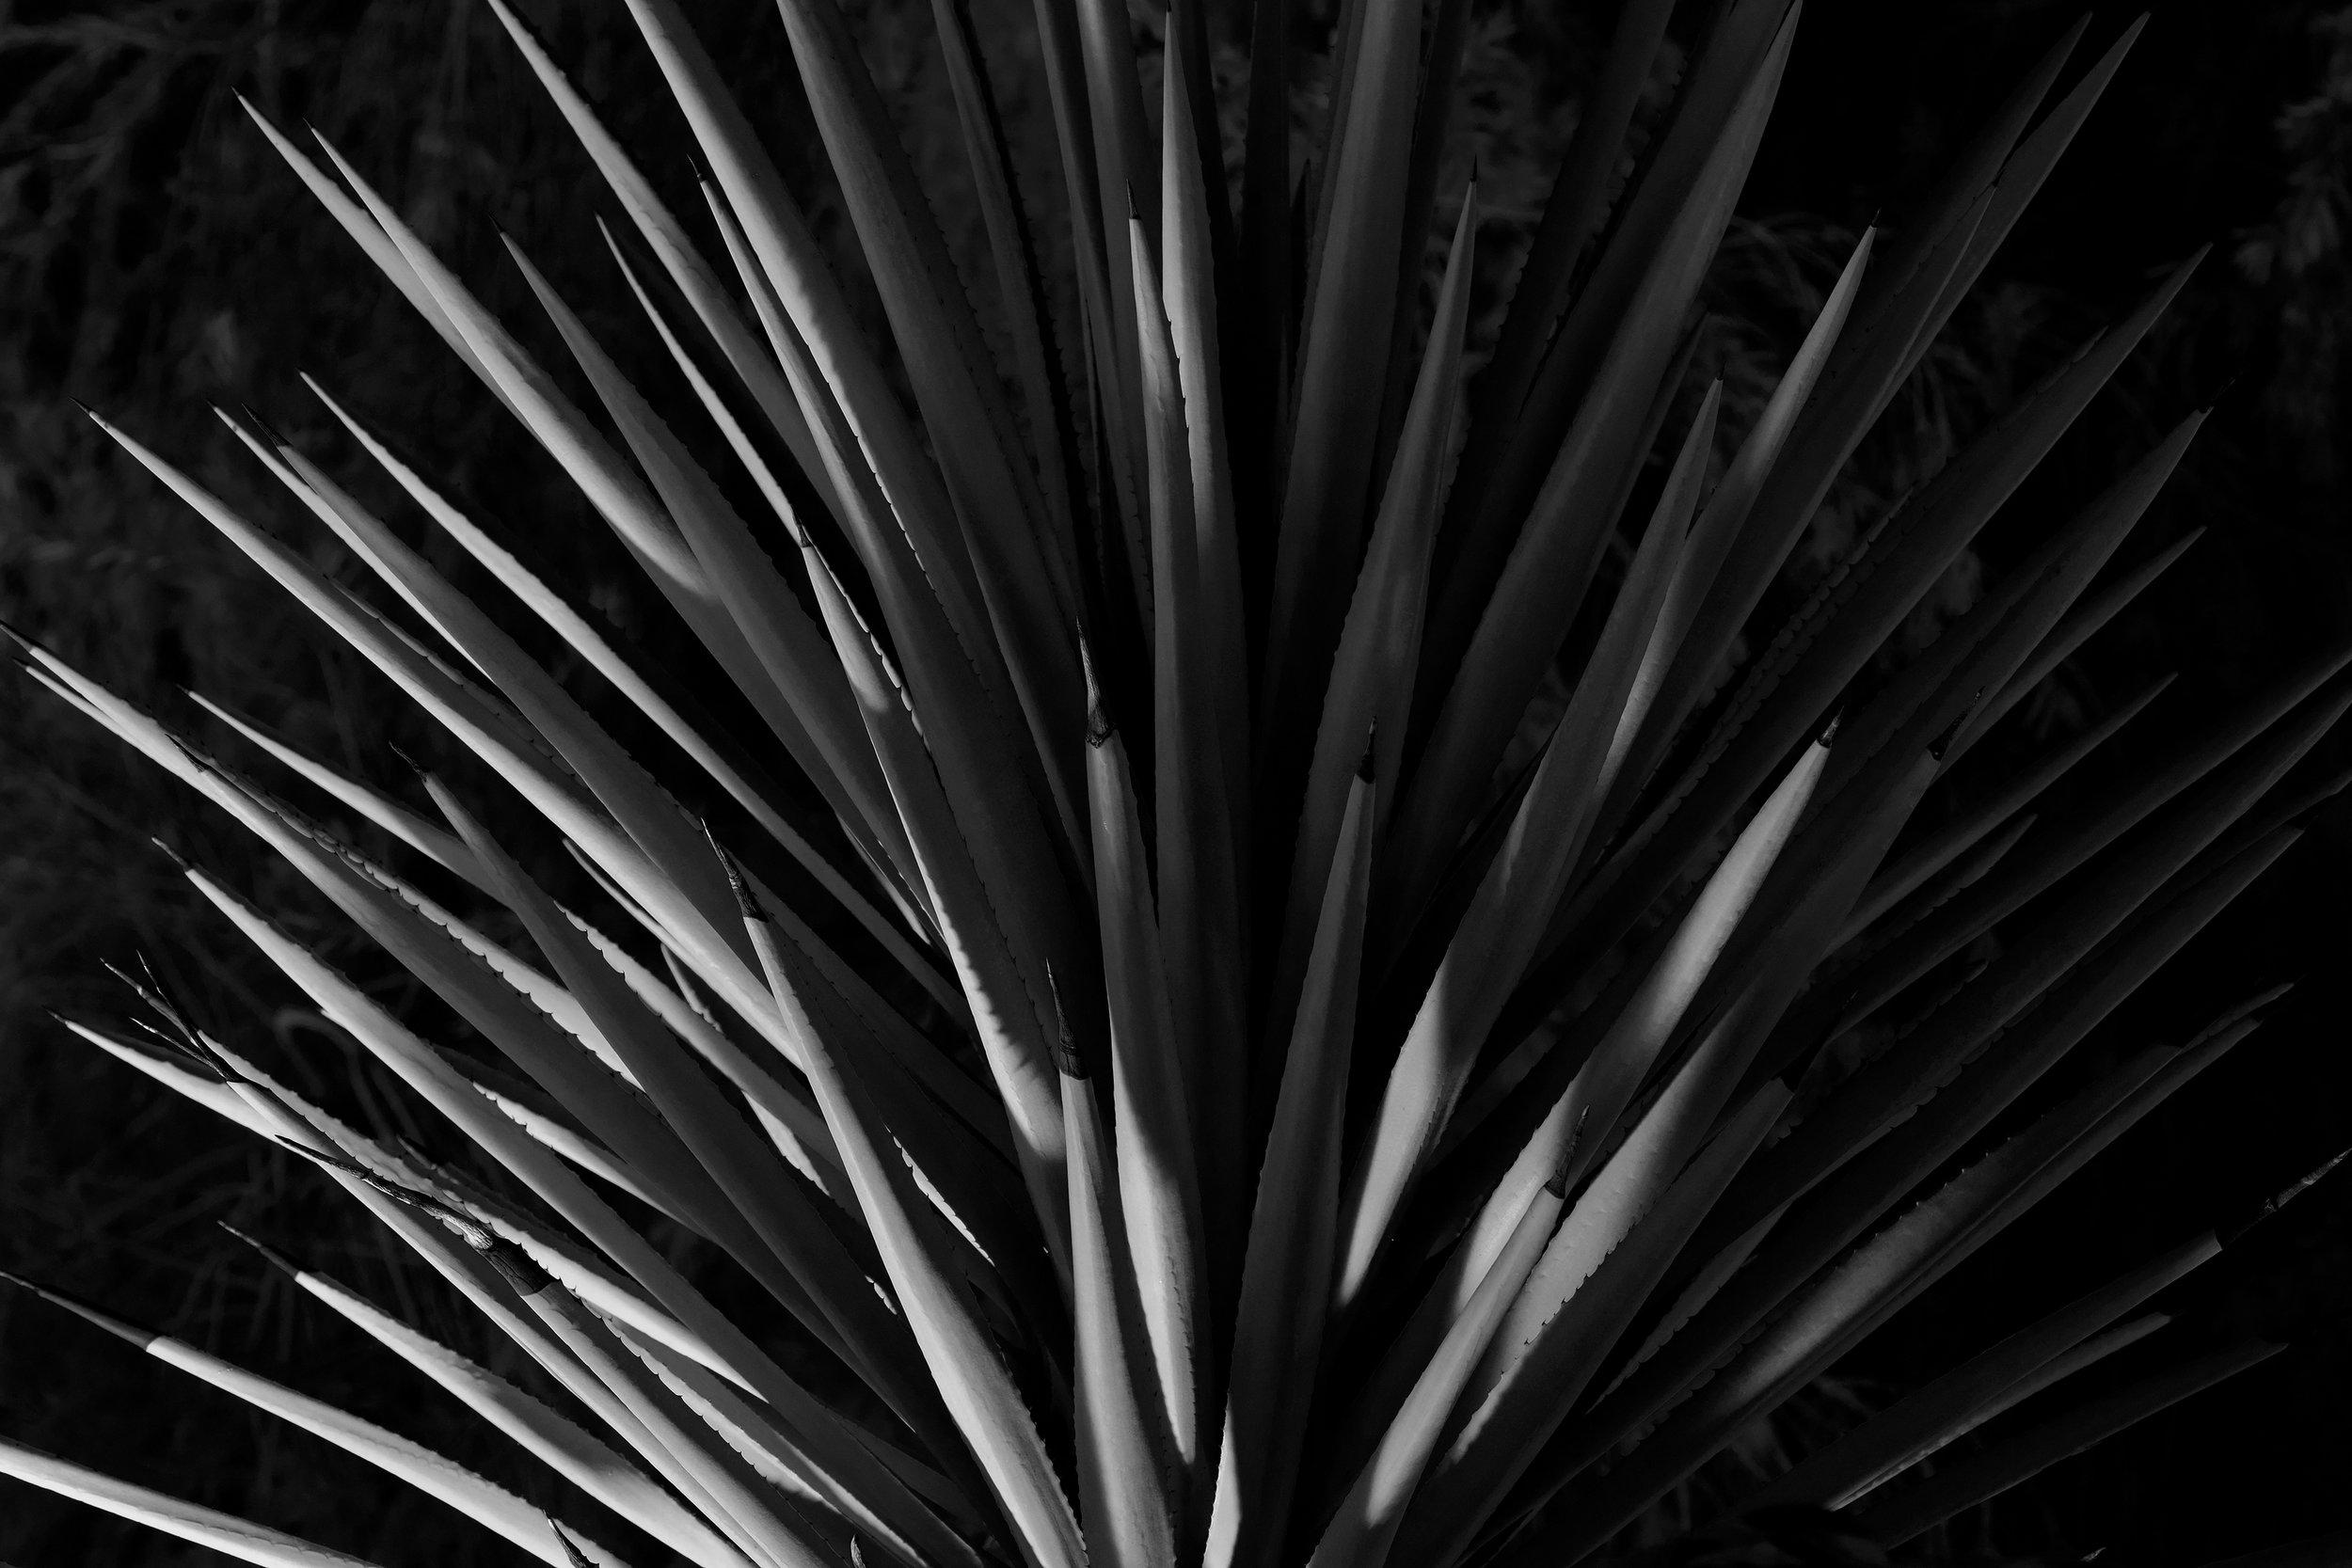 Spiky Night